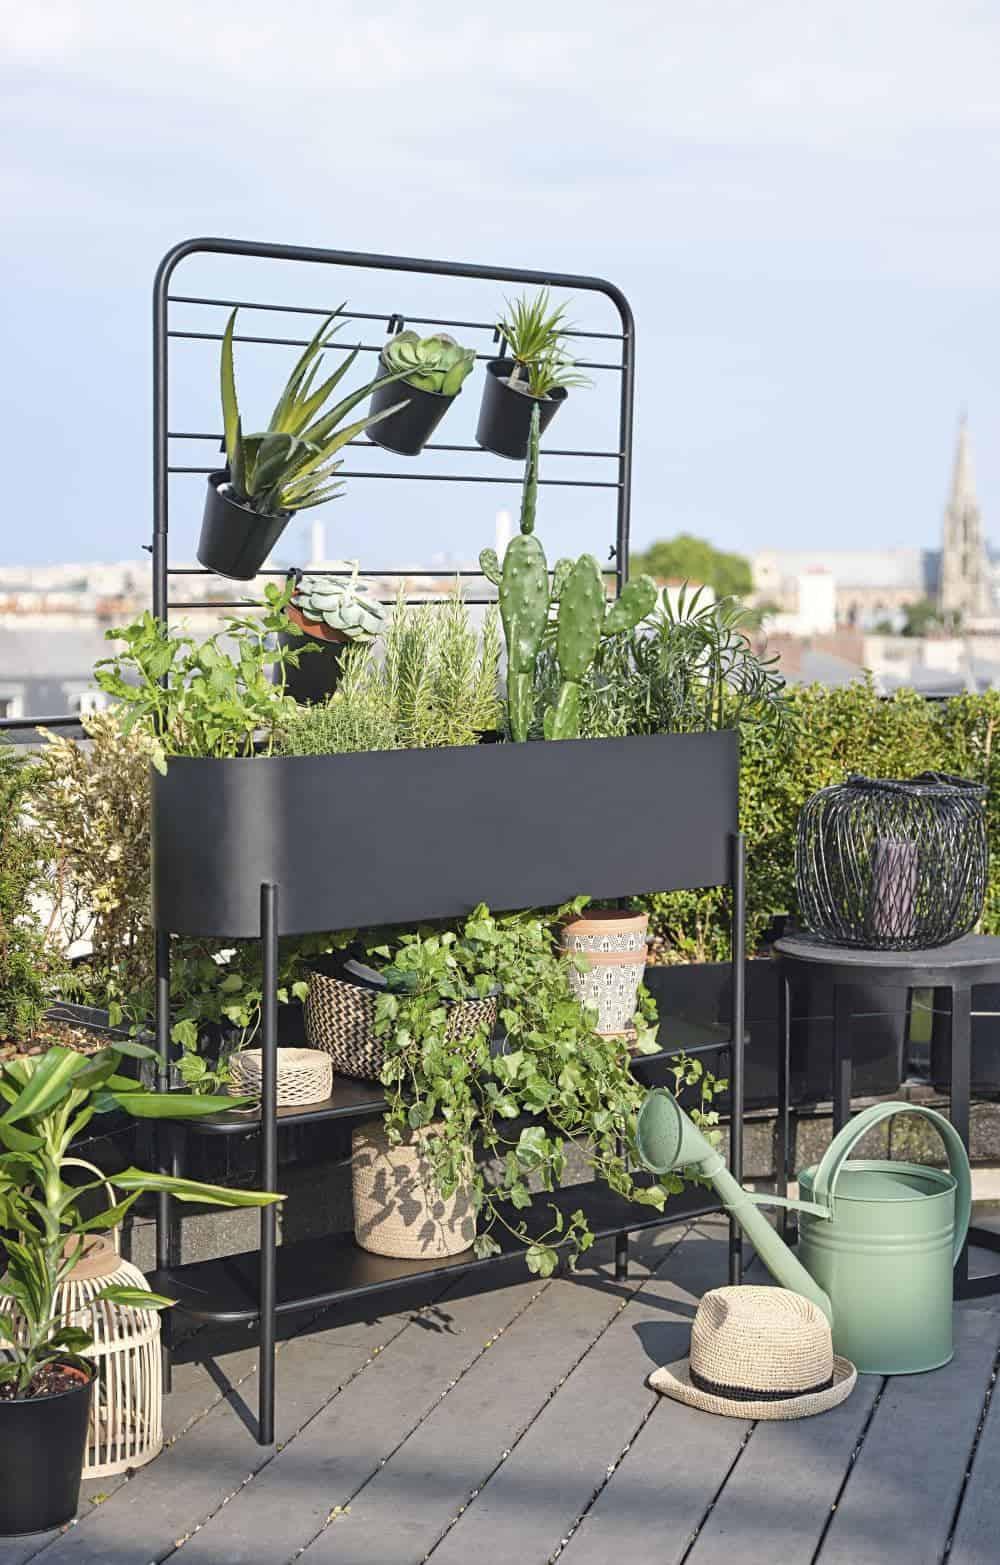 Black metal planter with pots